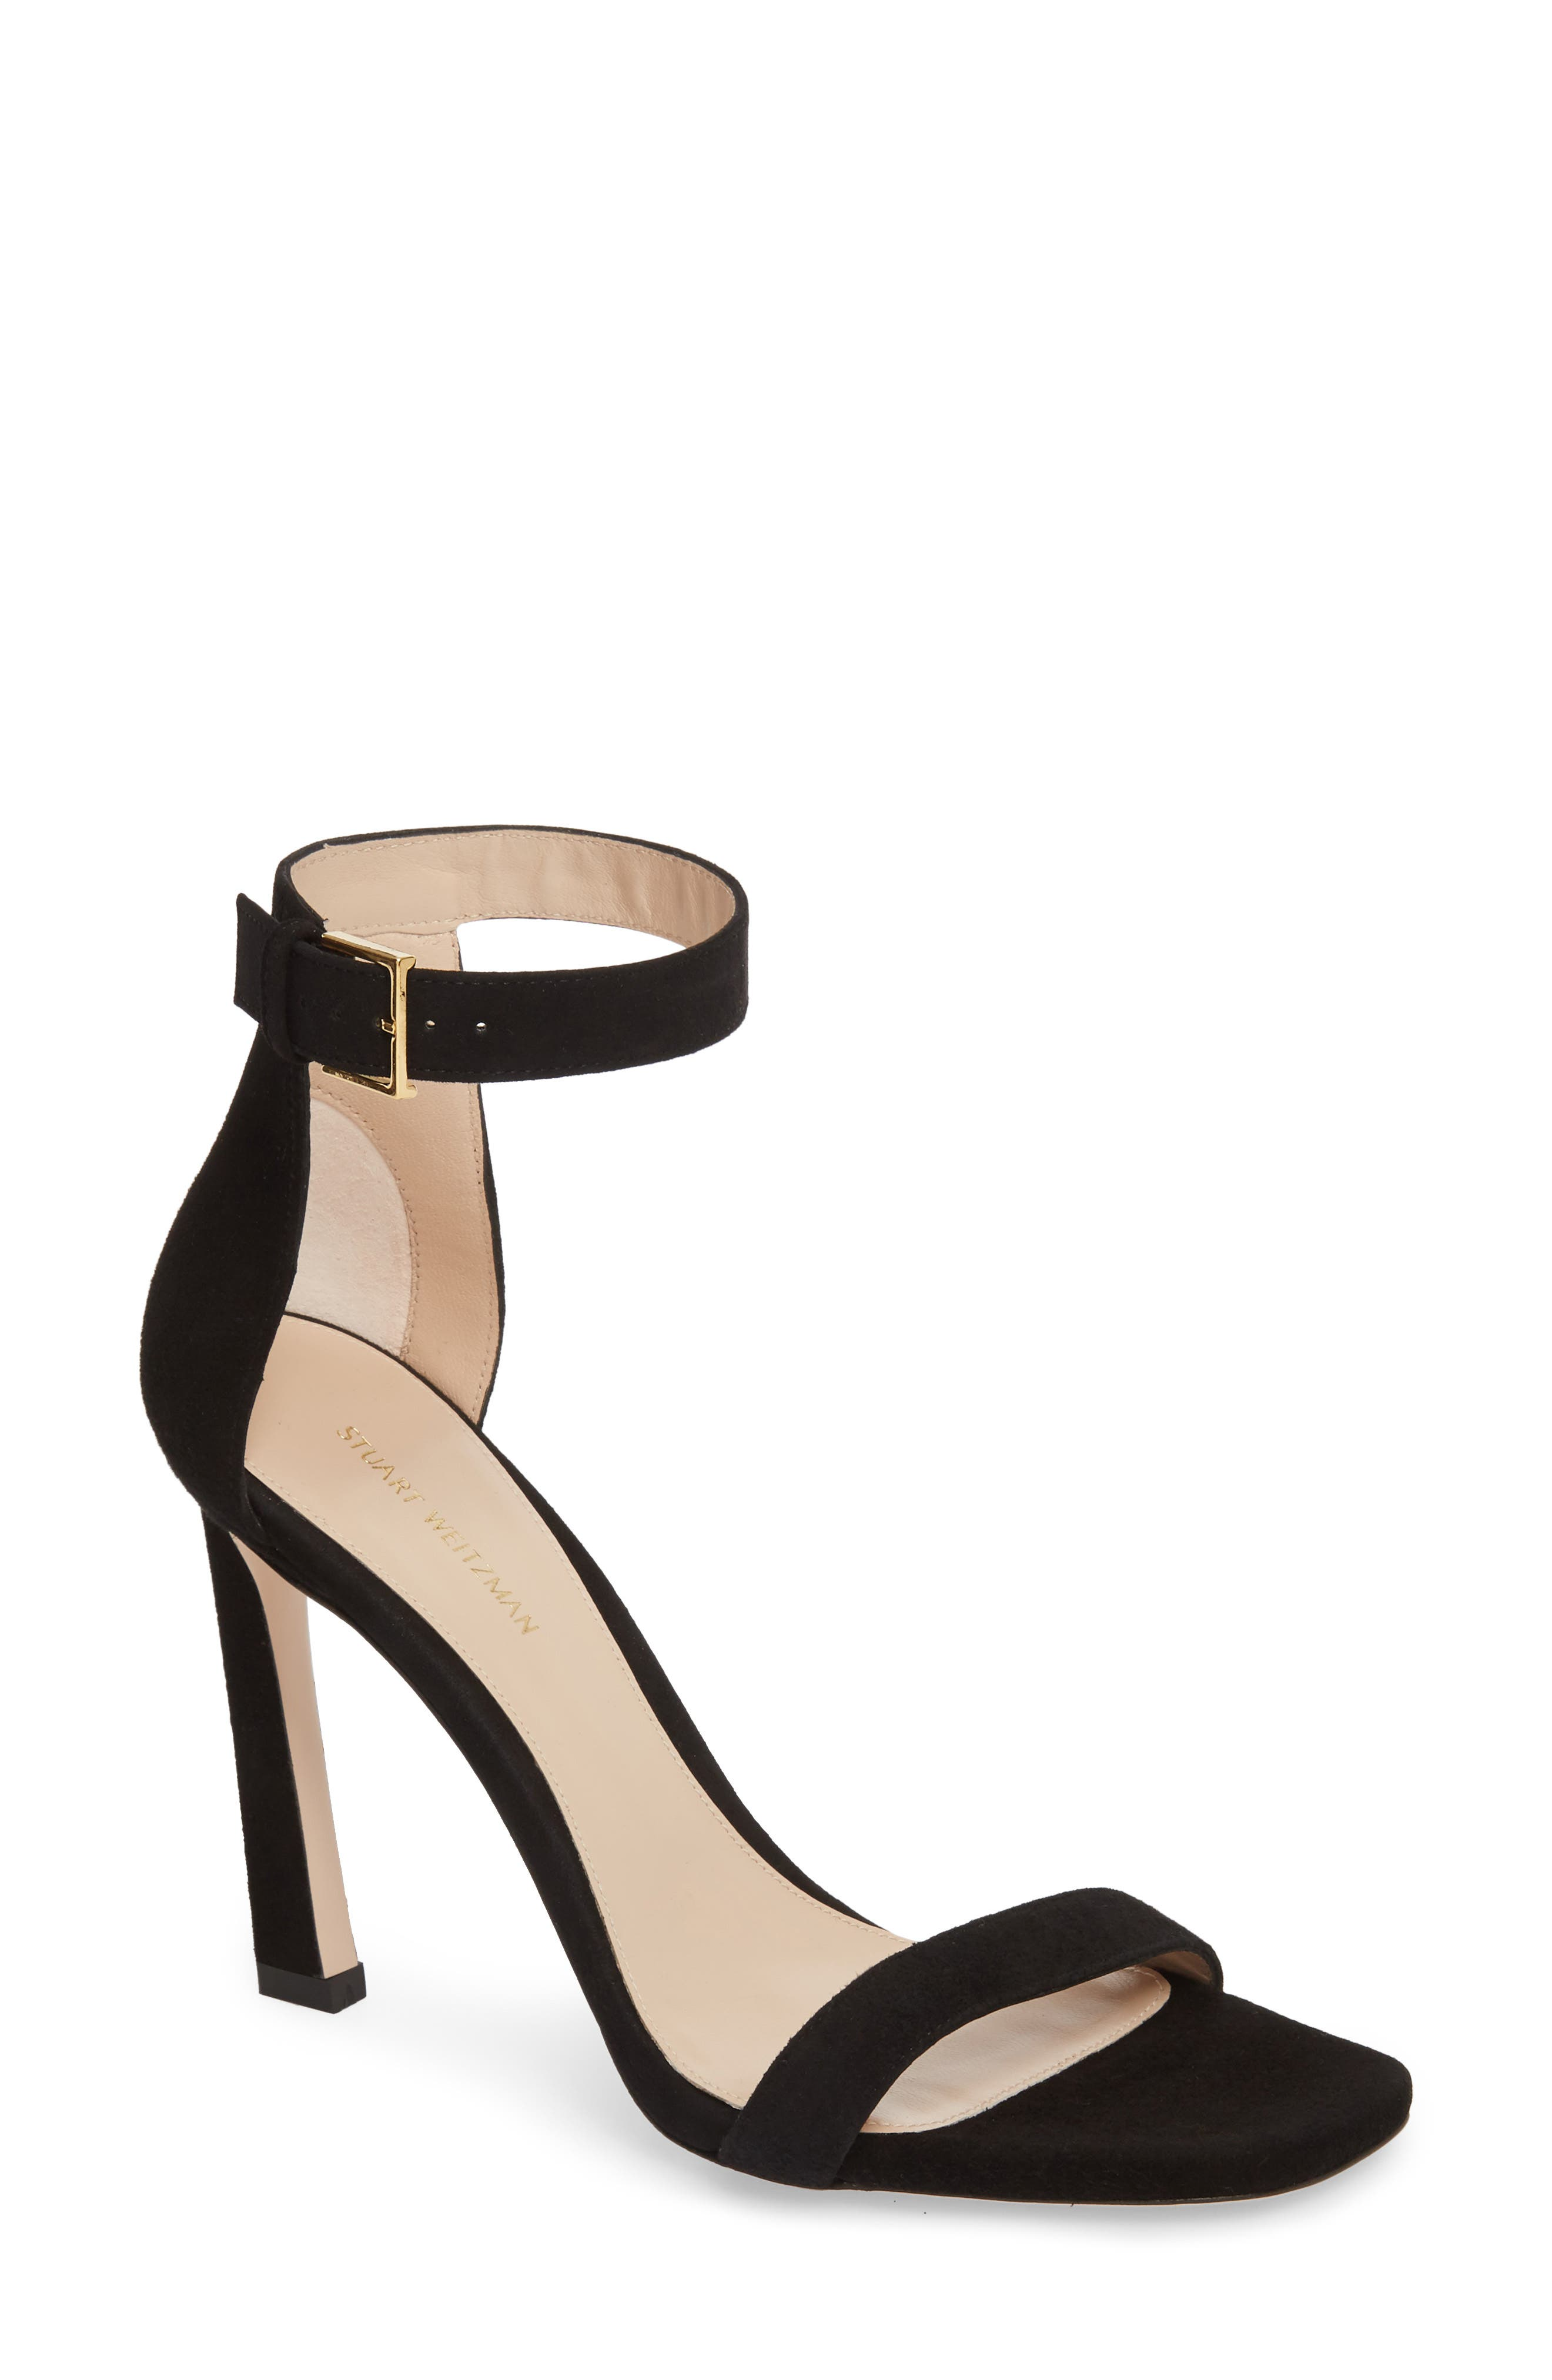 100SQUARENUDIST Sandal,                             Main thumbnail 1, color,                             Black Seda